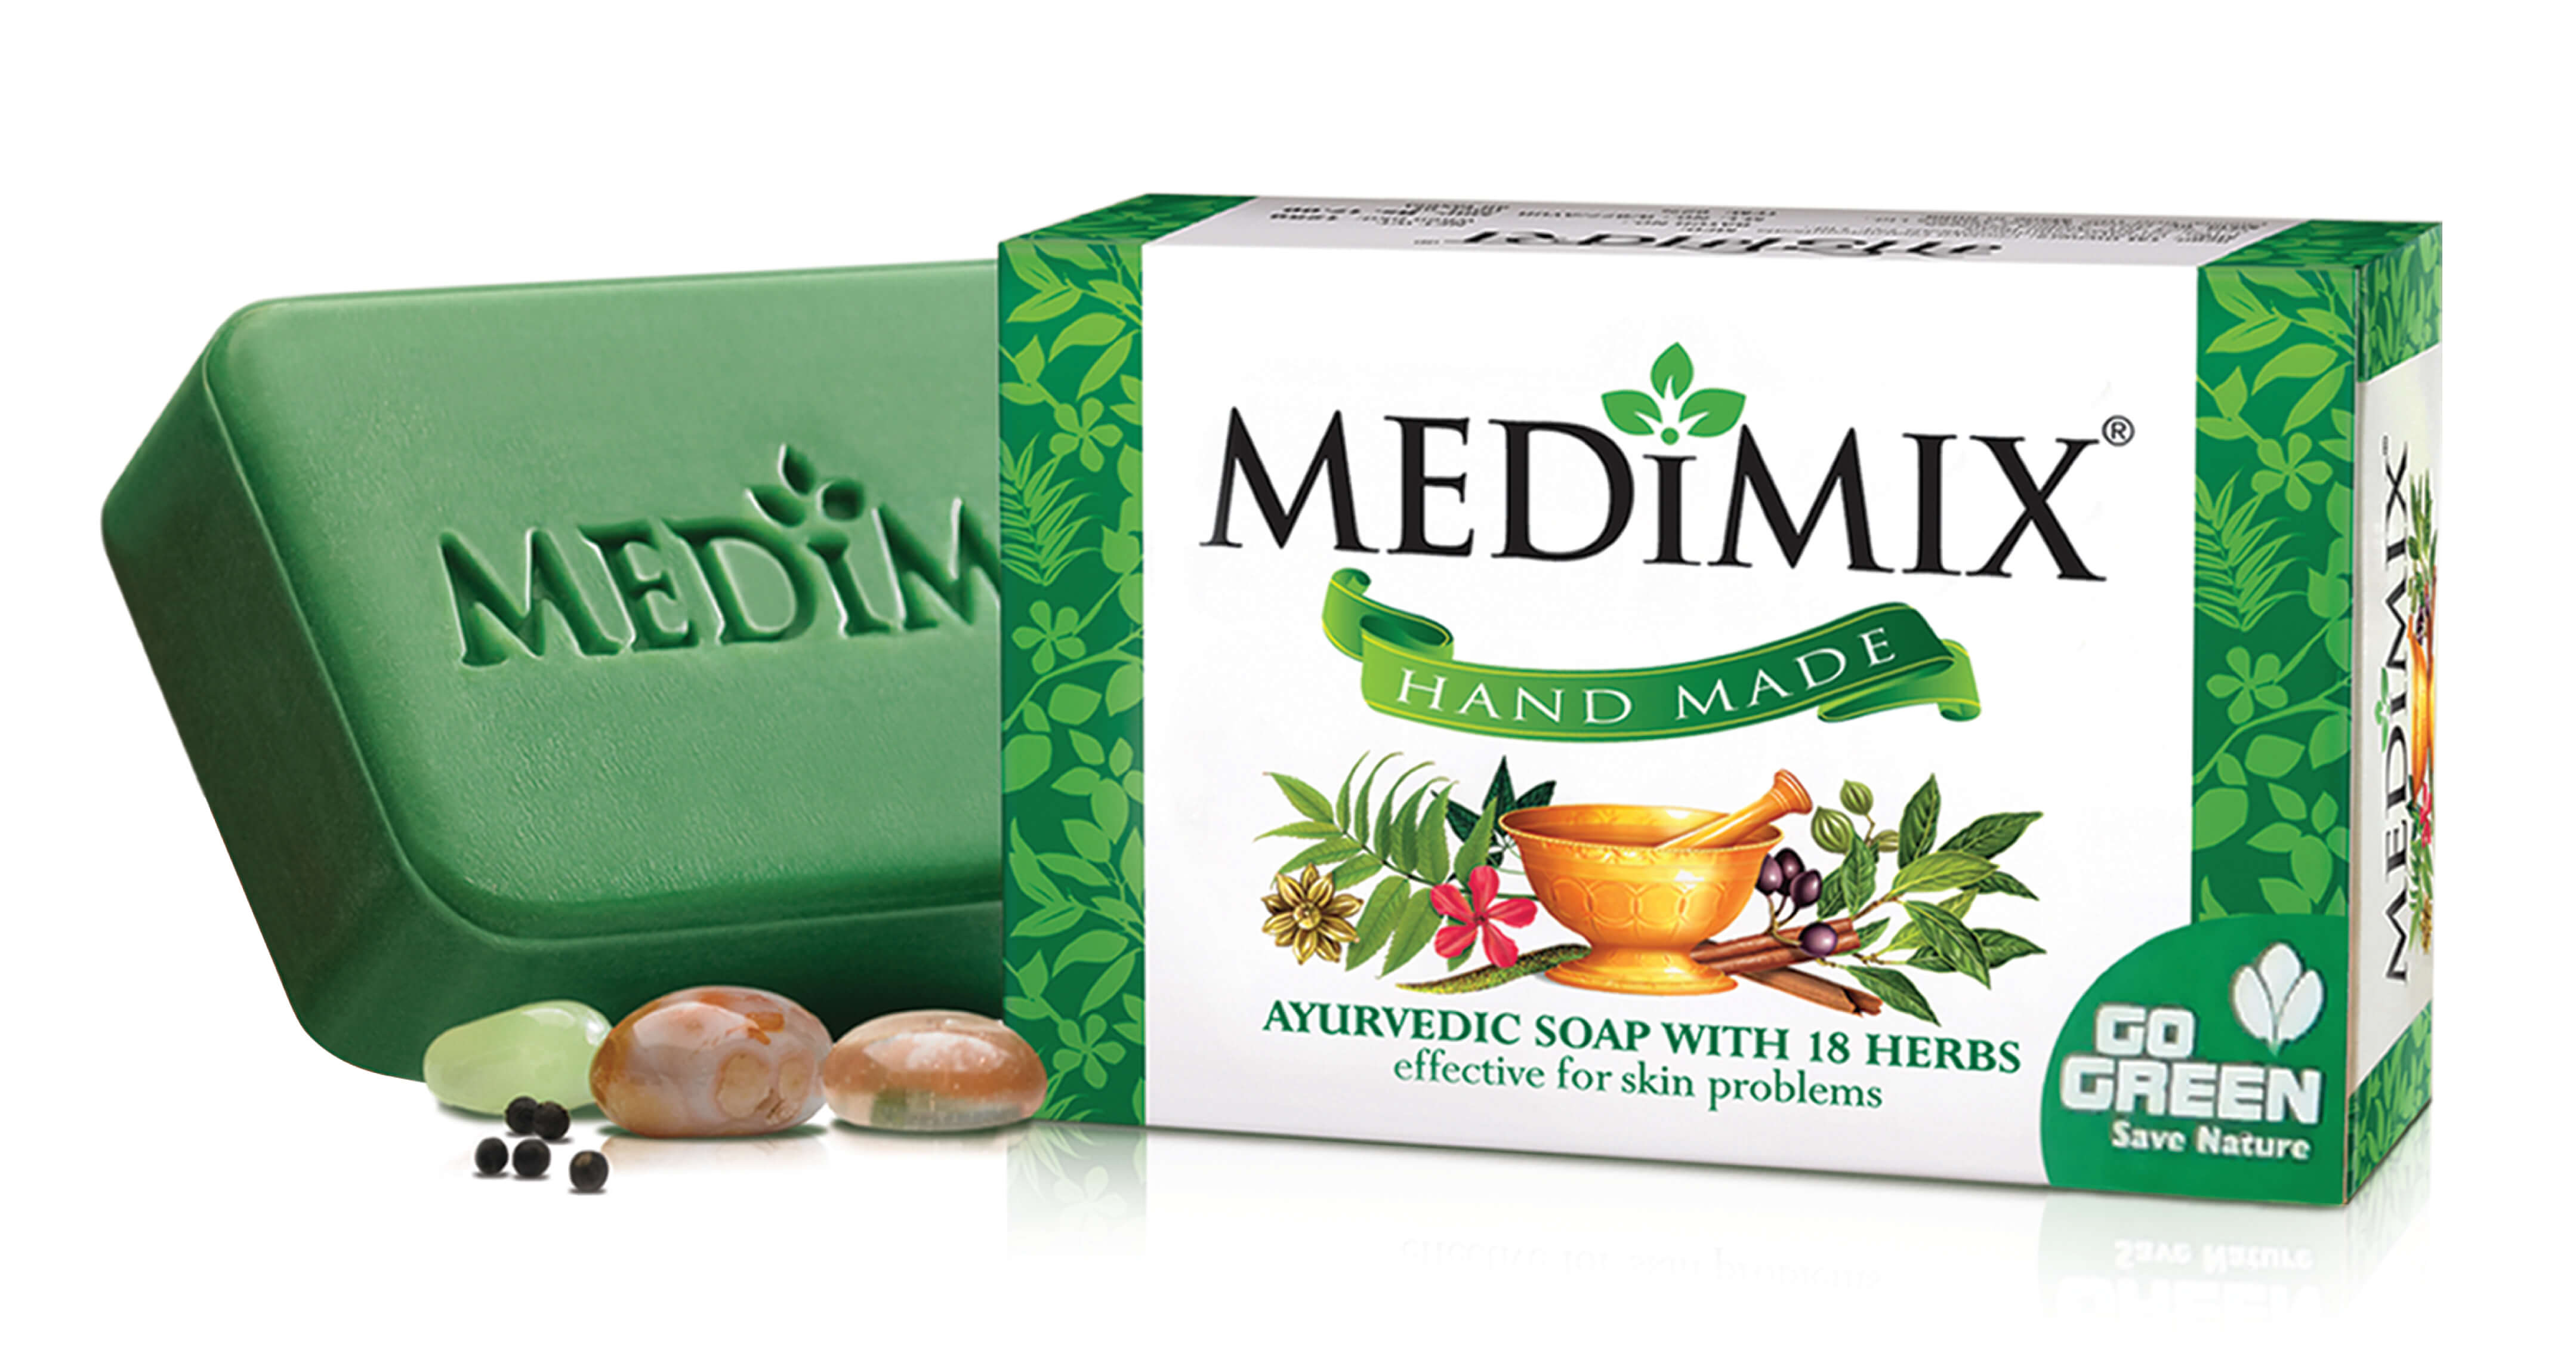 Medimix Soap Image